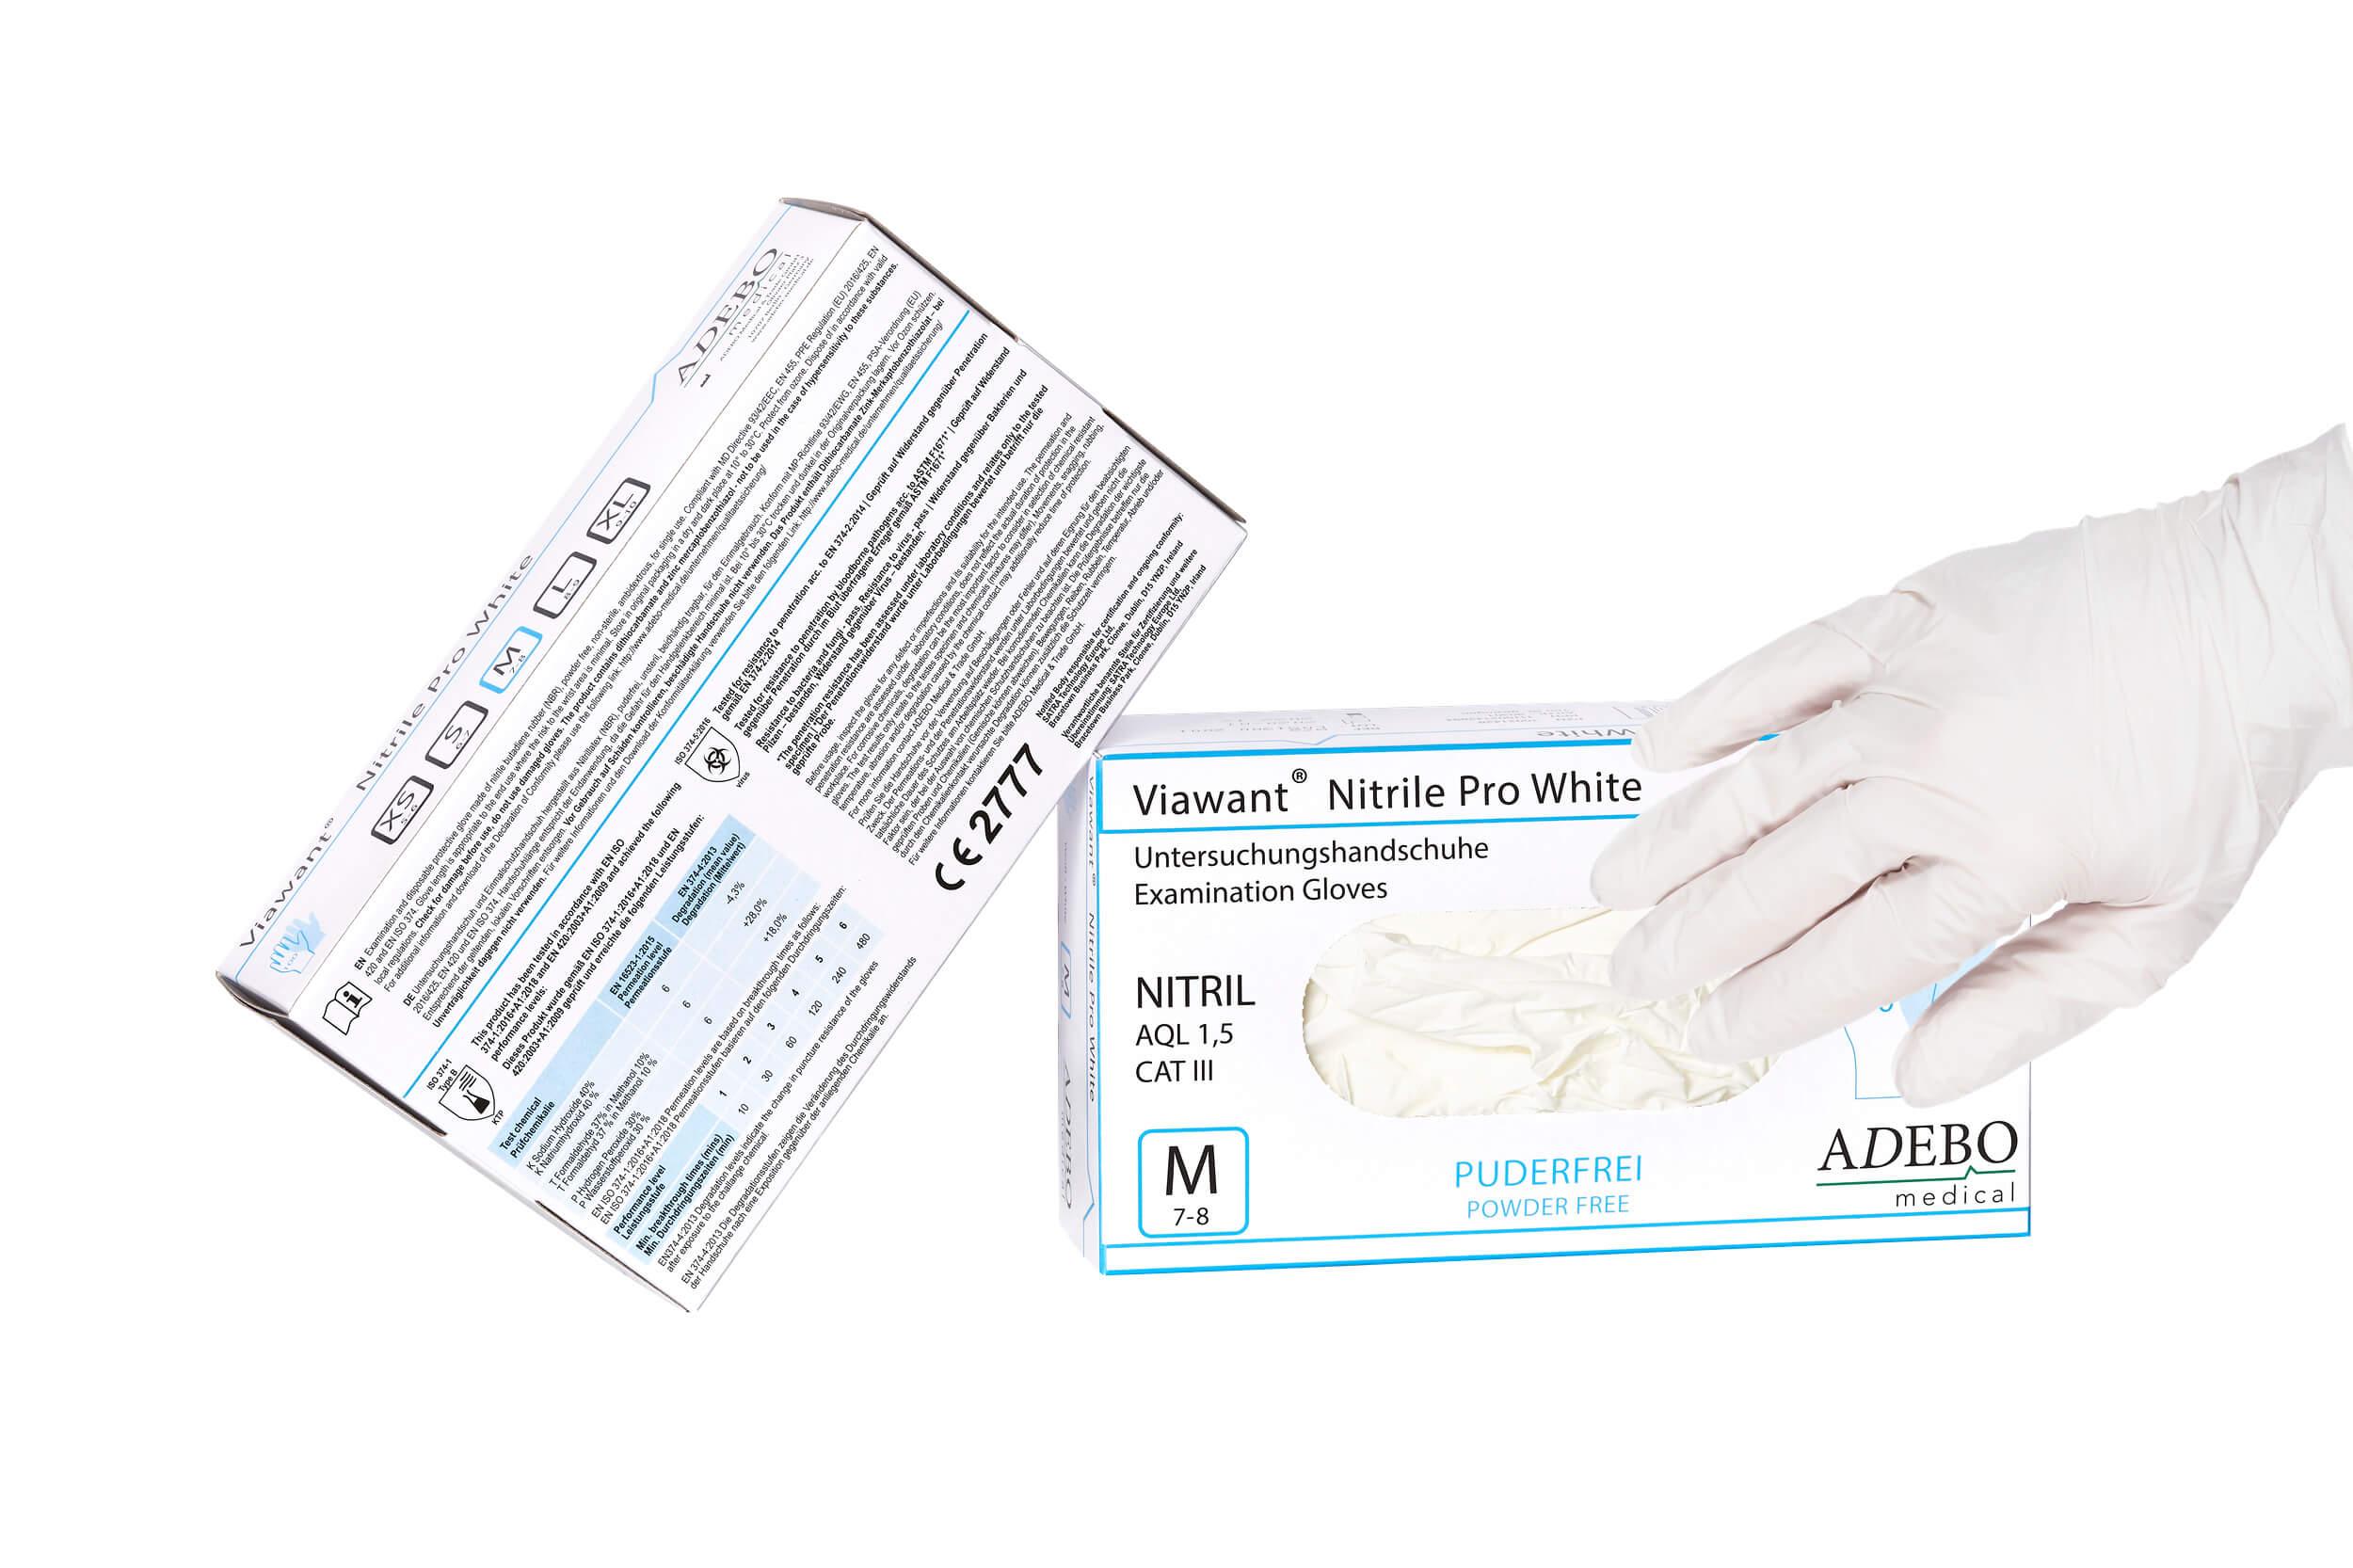 Viawant Nitrile Pro White - Einmalhandschuhe aus Nitril, Farbe: WEISS